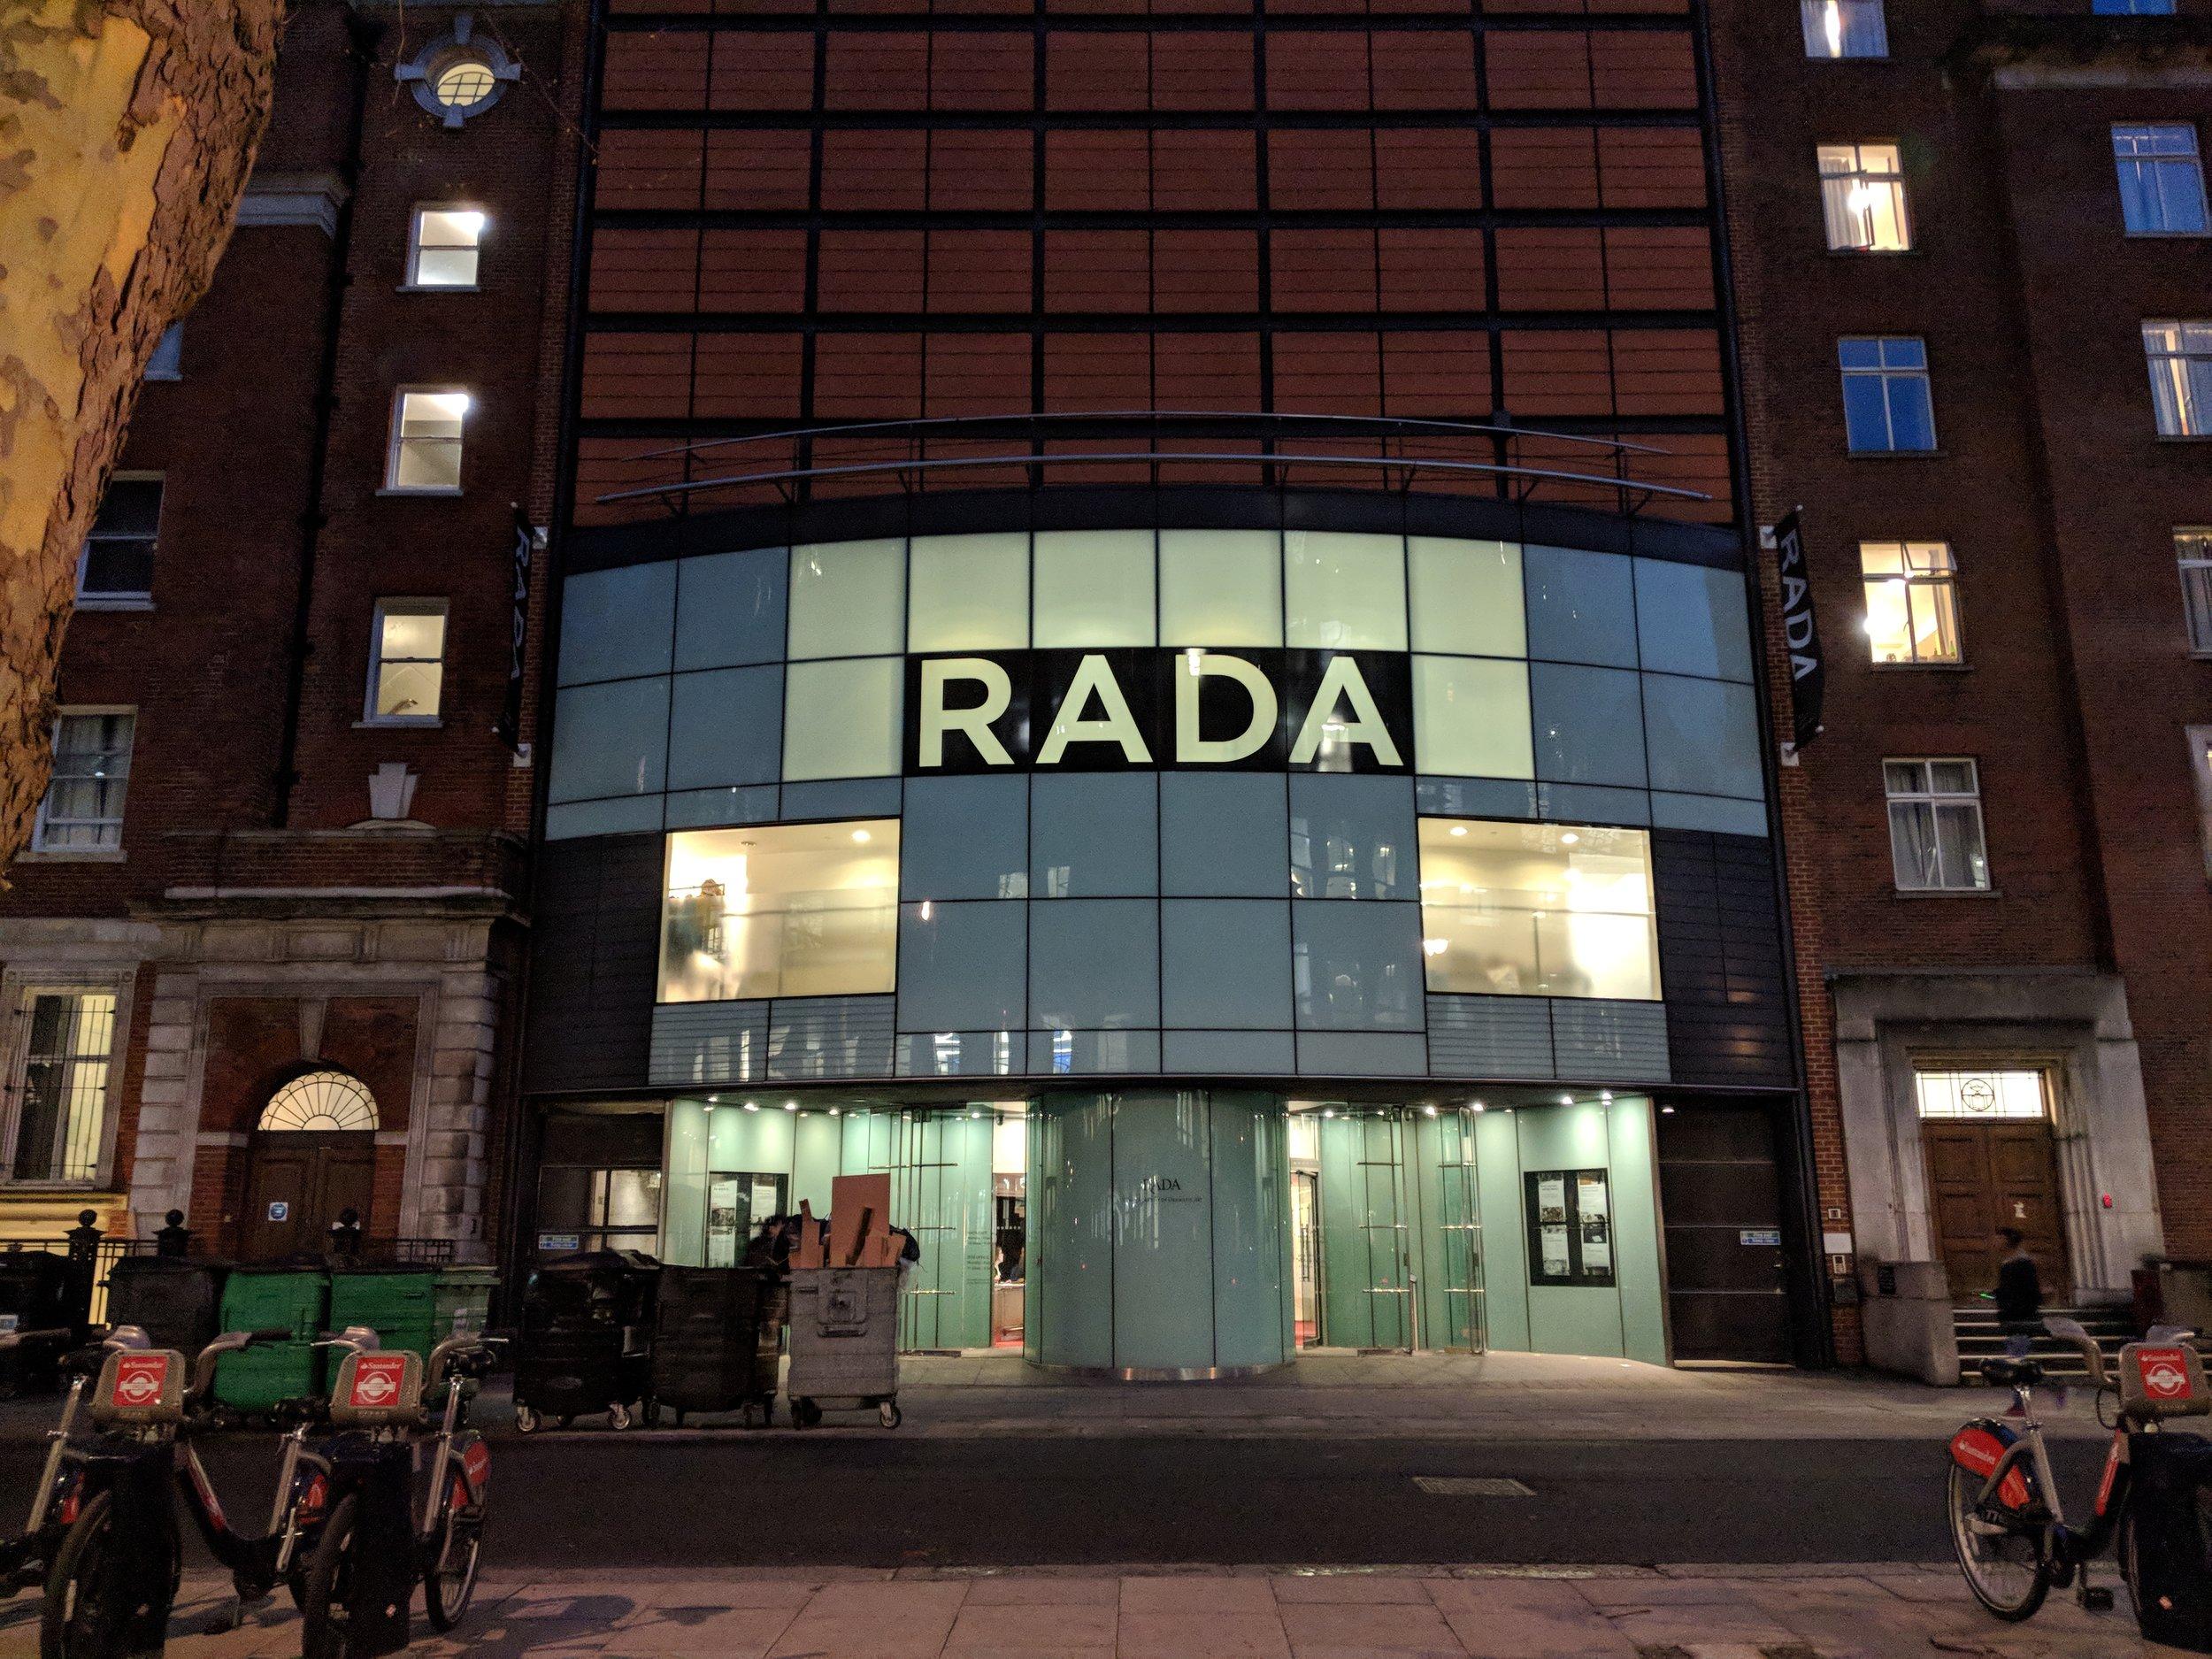 RADA(Jerwood Vanbrugh Theatre) - visited 18/03/2019